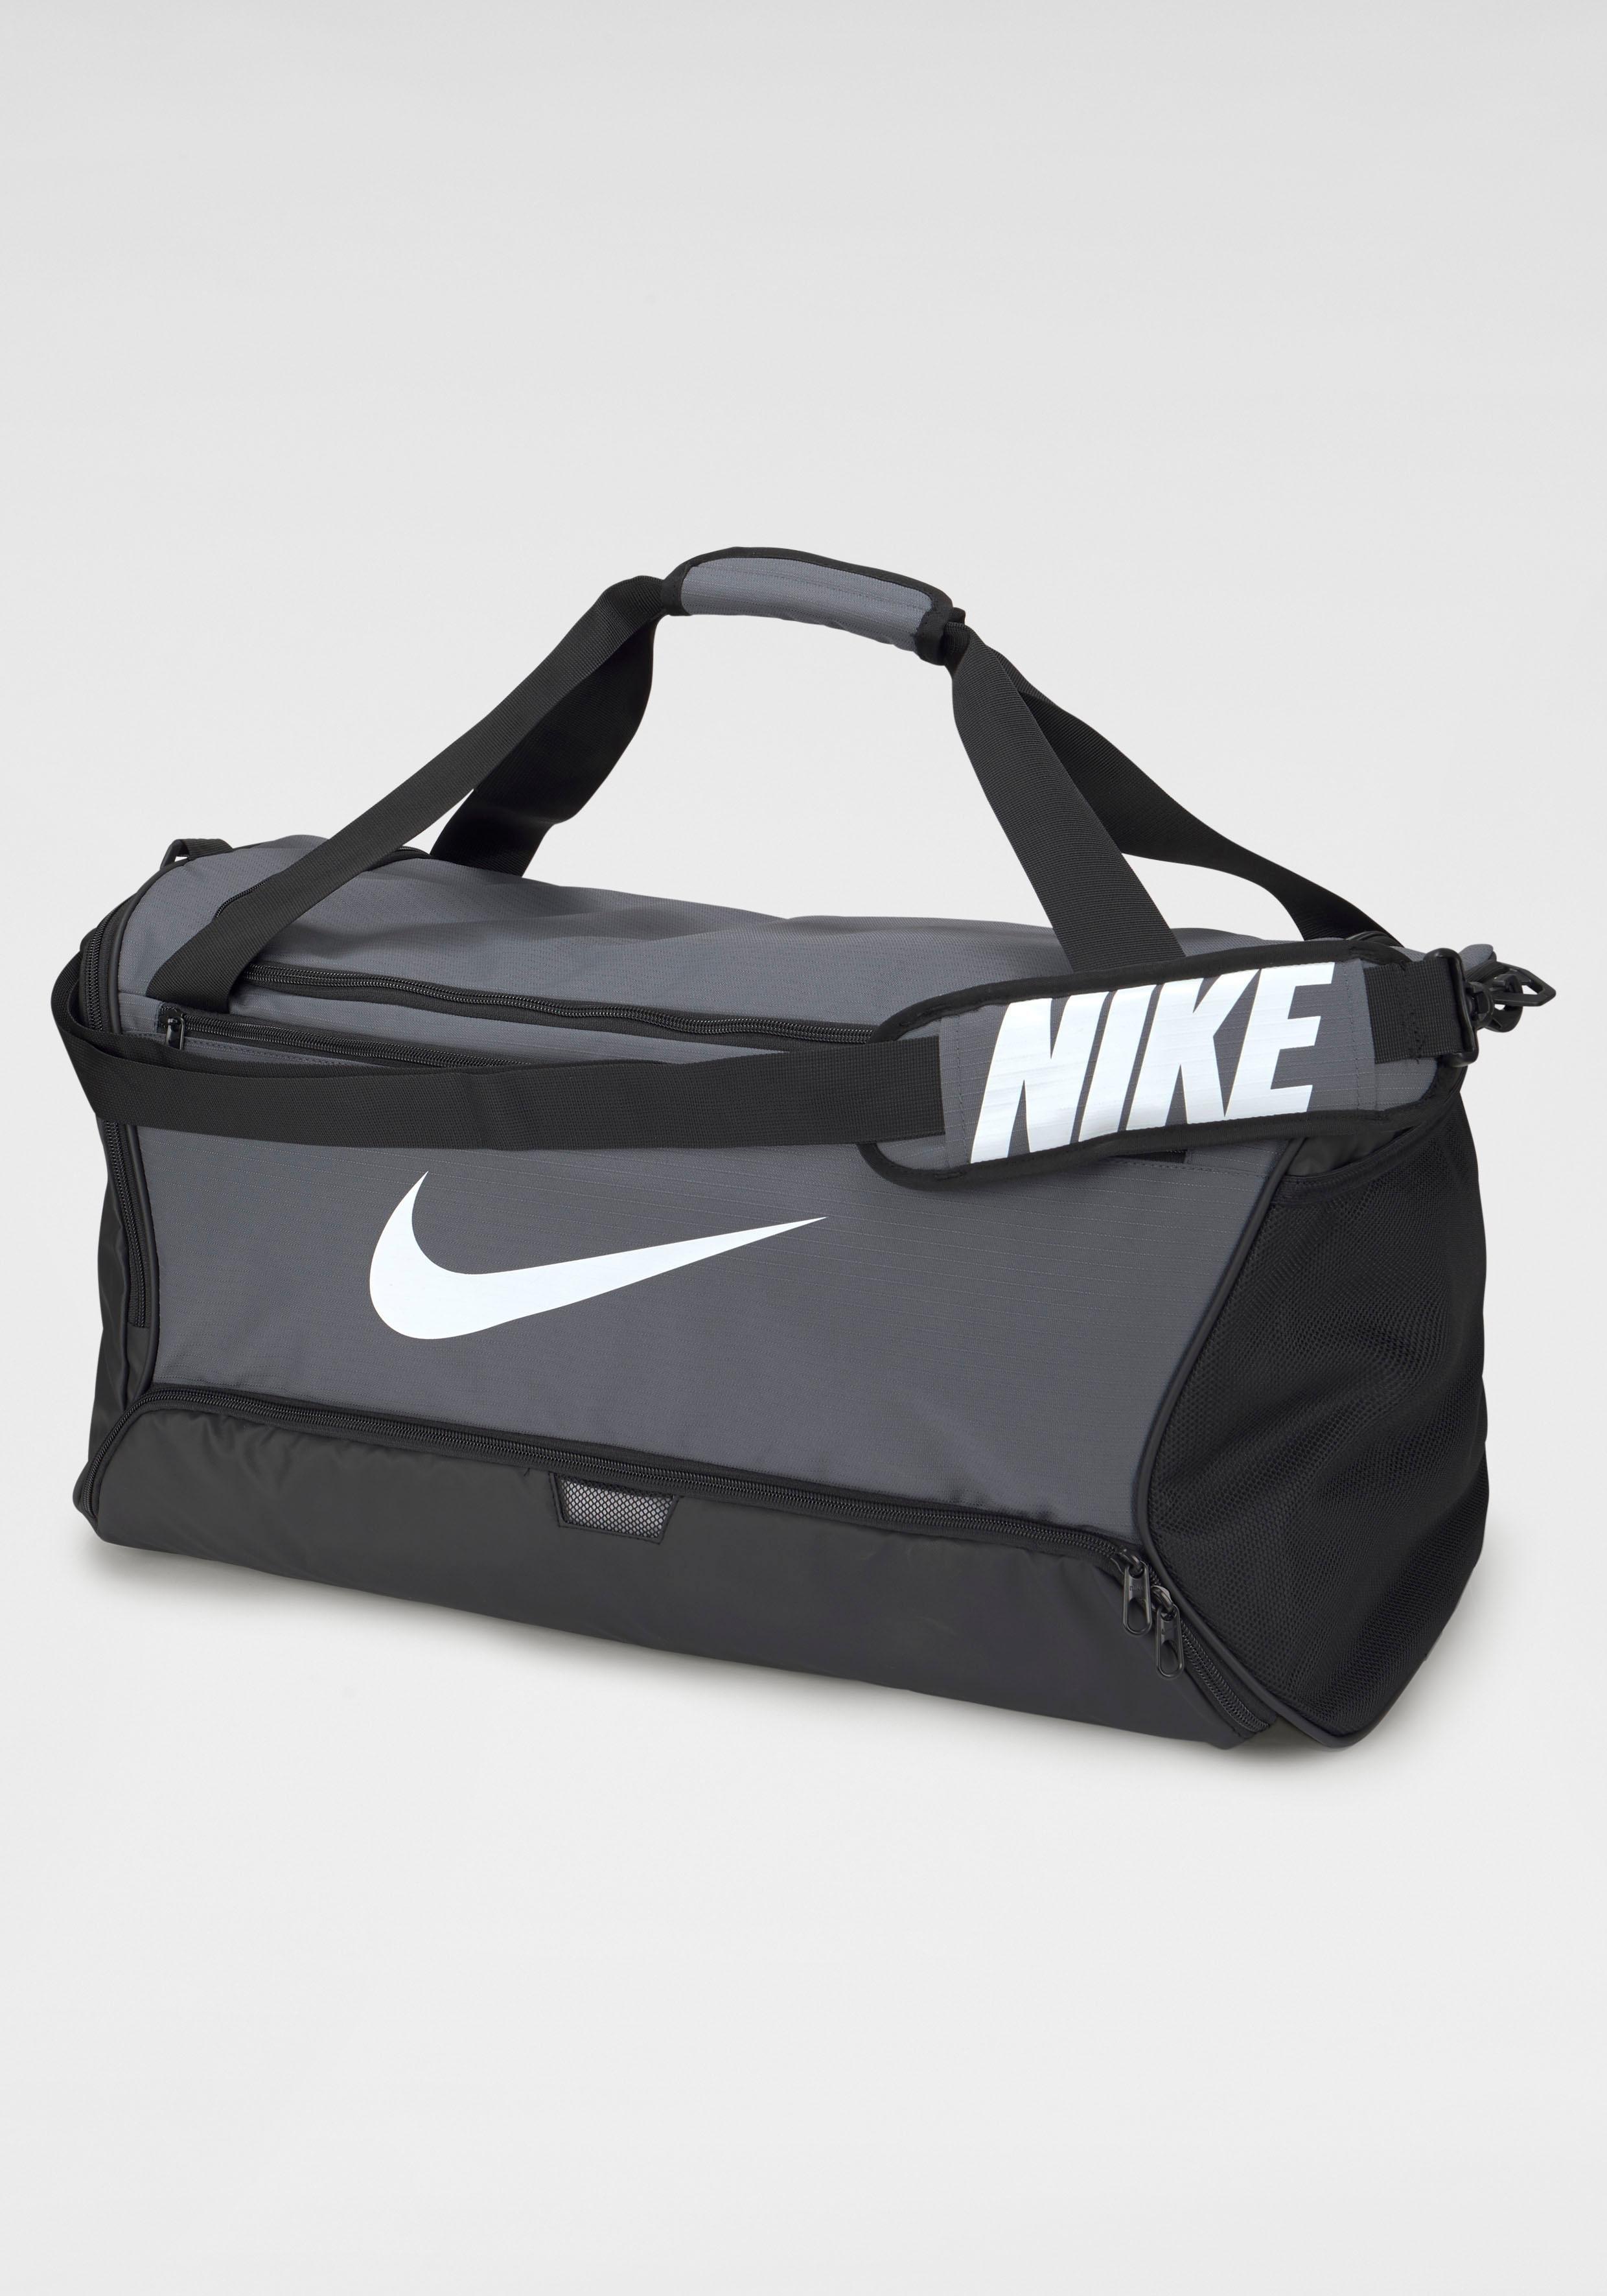 Nike Sporttas BRASILIA TRAINING DUFFEL BAG (MEDIUM) goedkoop op otto.nl kopen